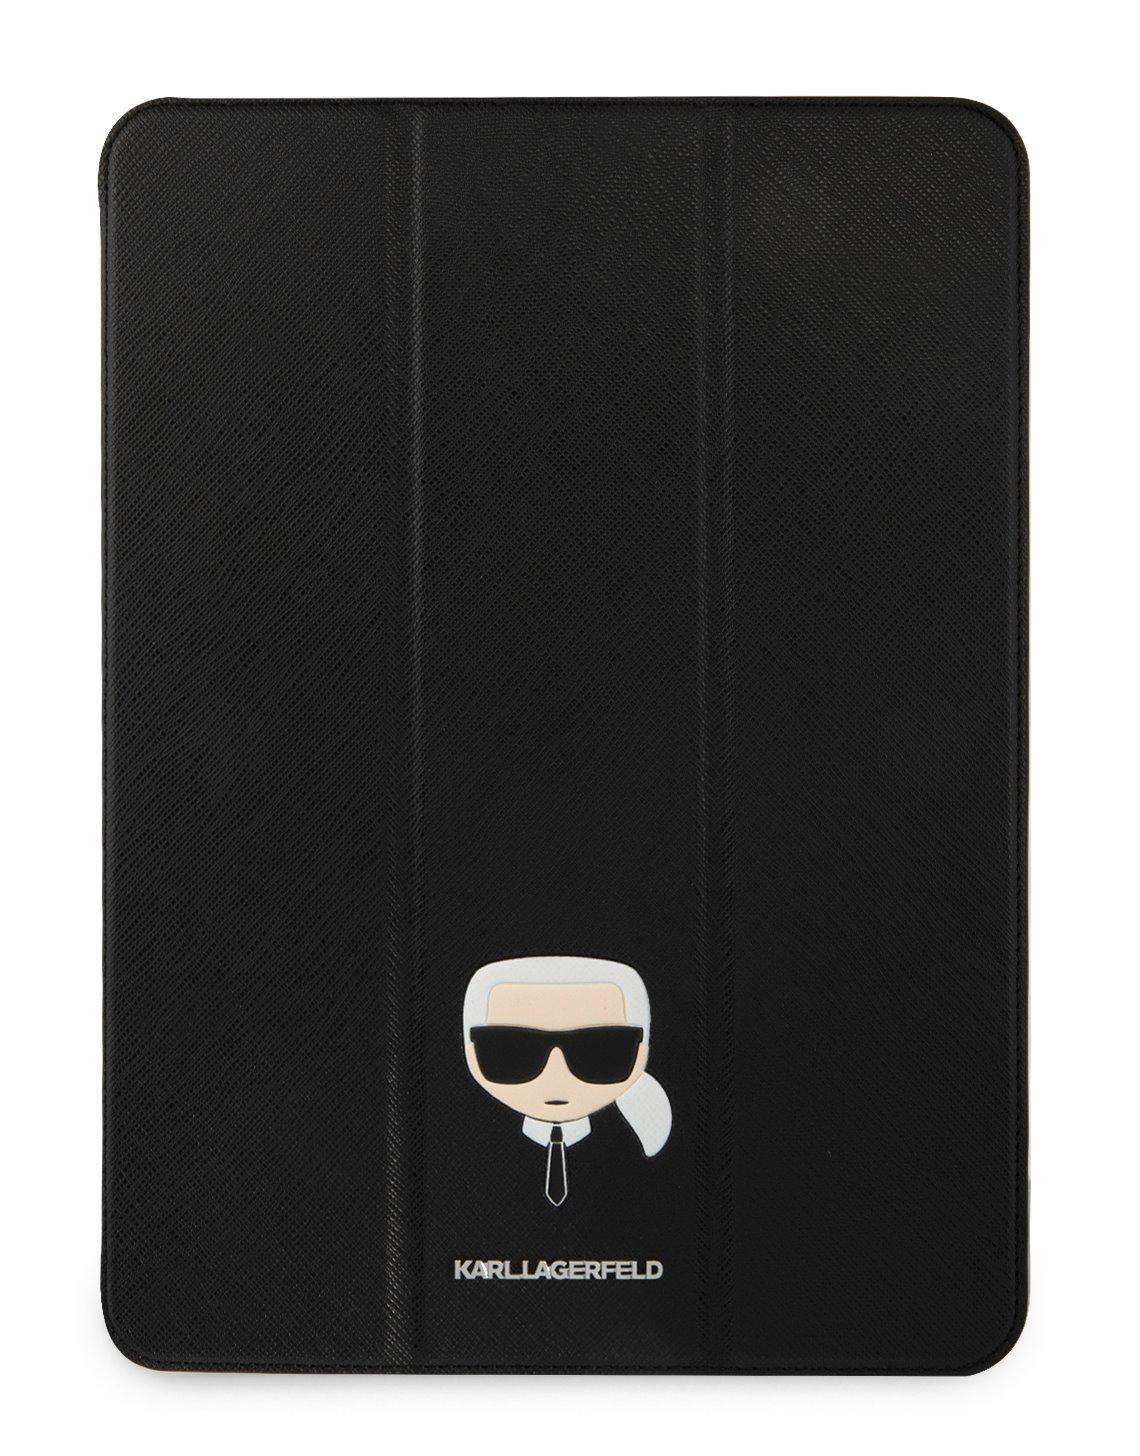 Pouzdro na tablet Karl Lagerfeld Head Saffiano KLFC11OKHK pro Apple iPad Pro 11, černá